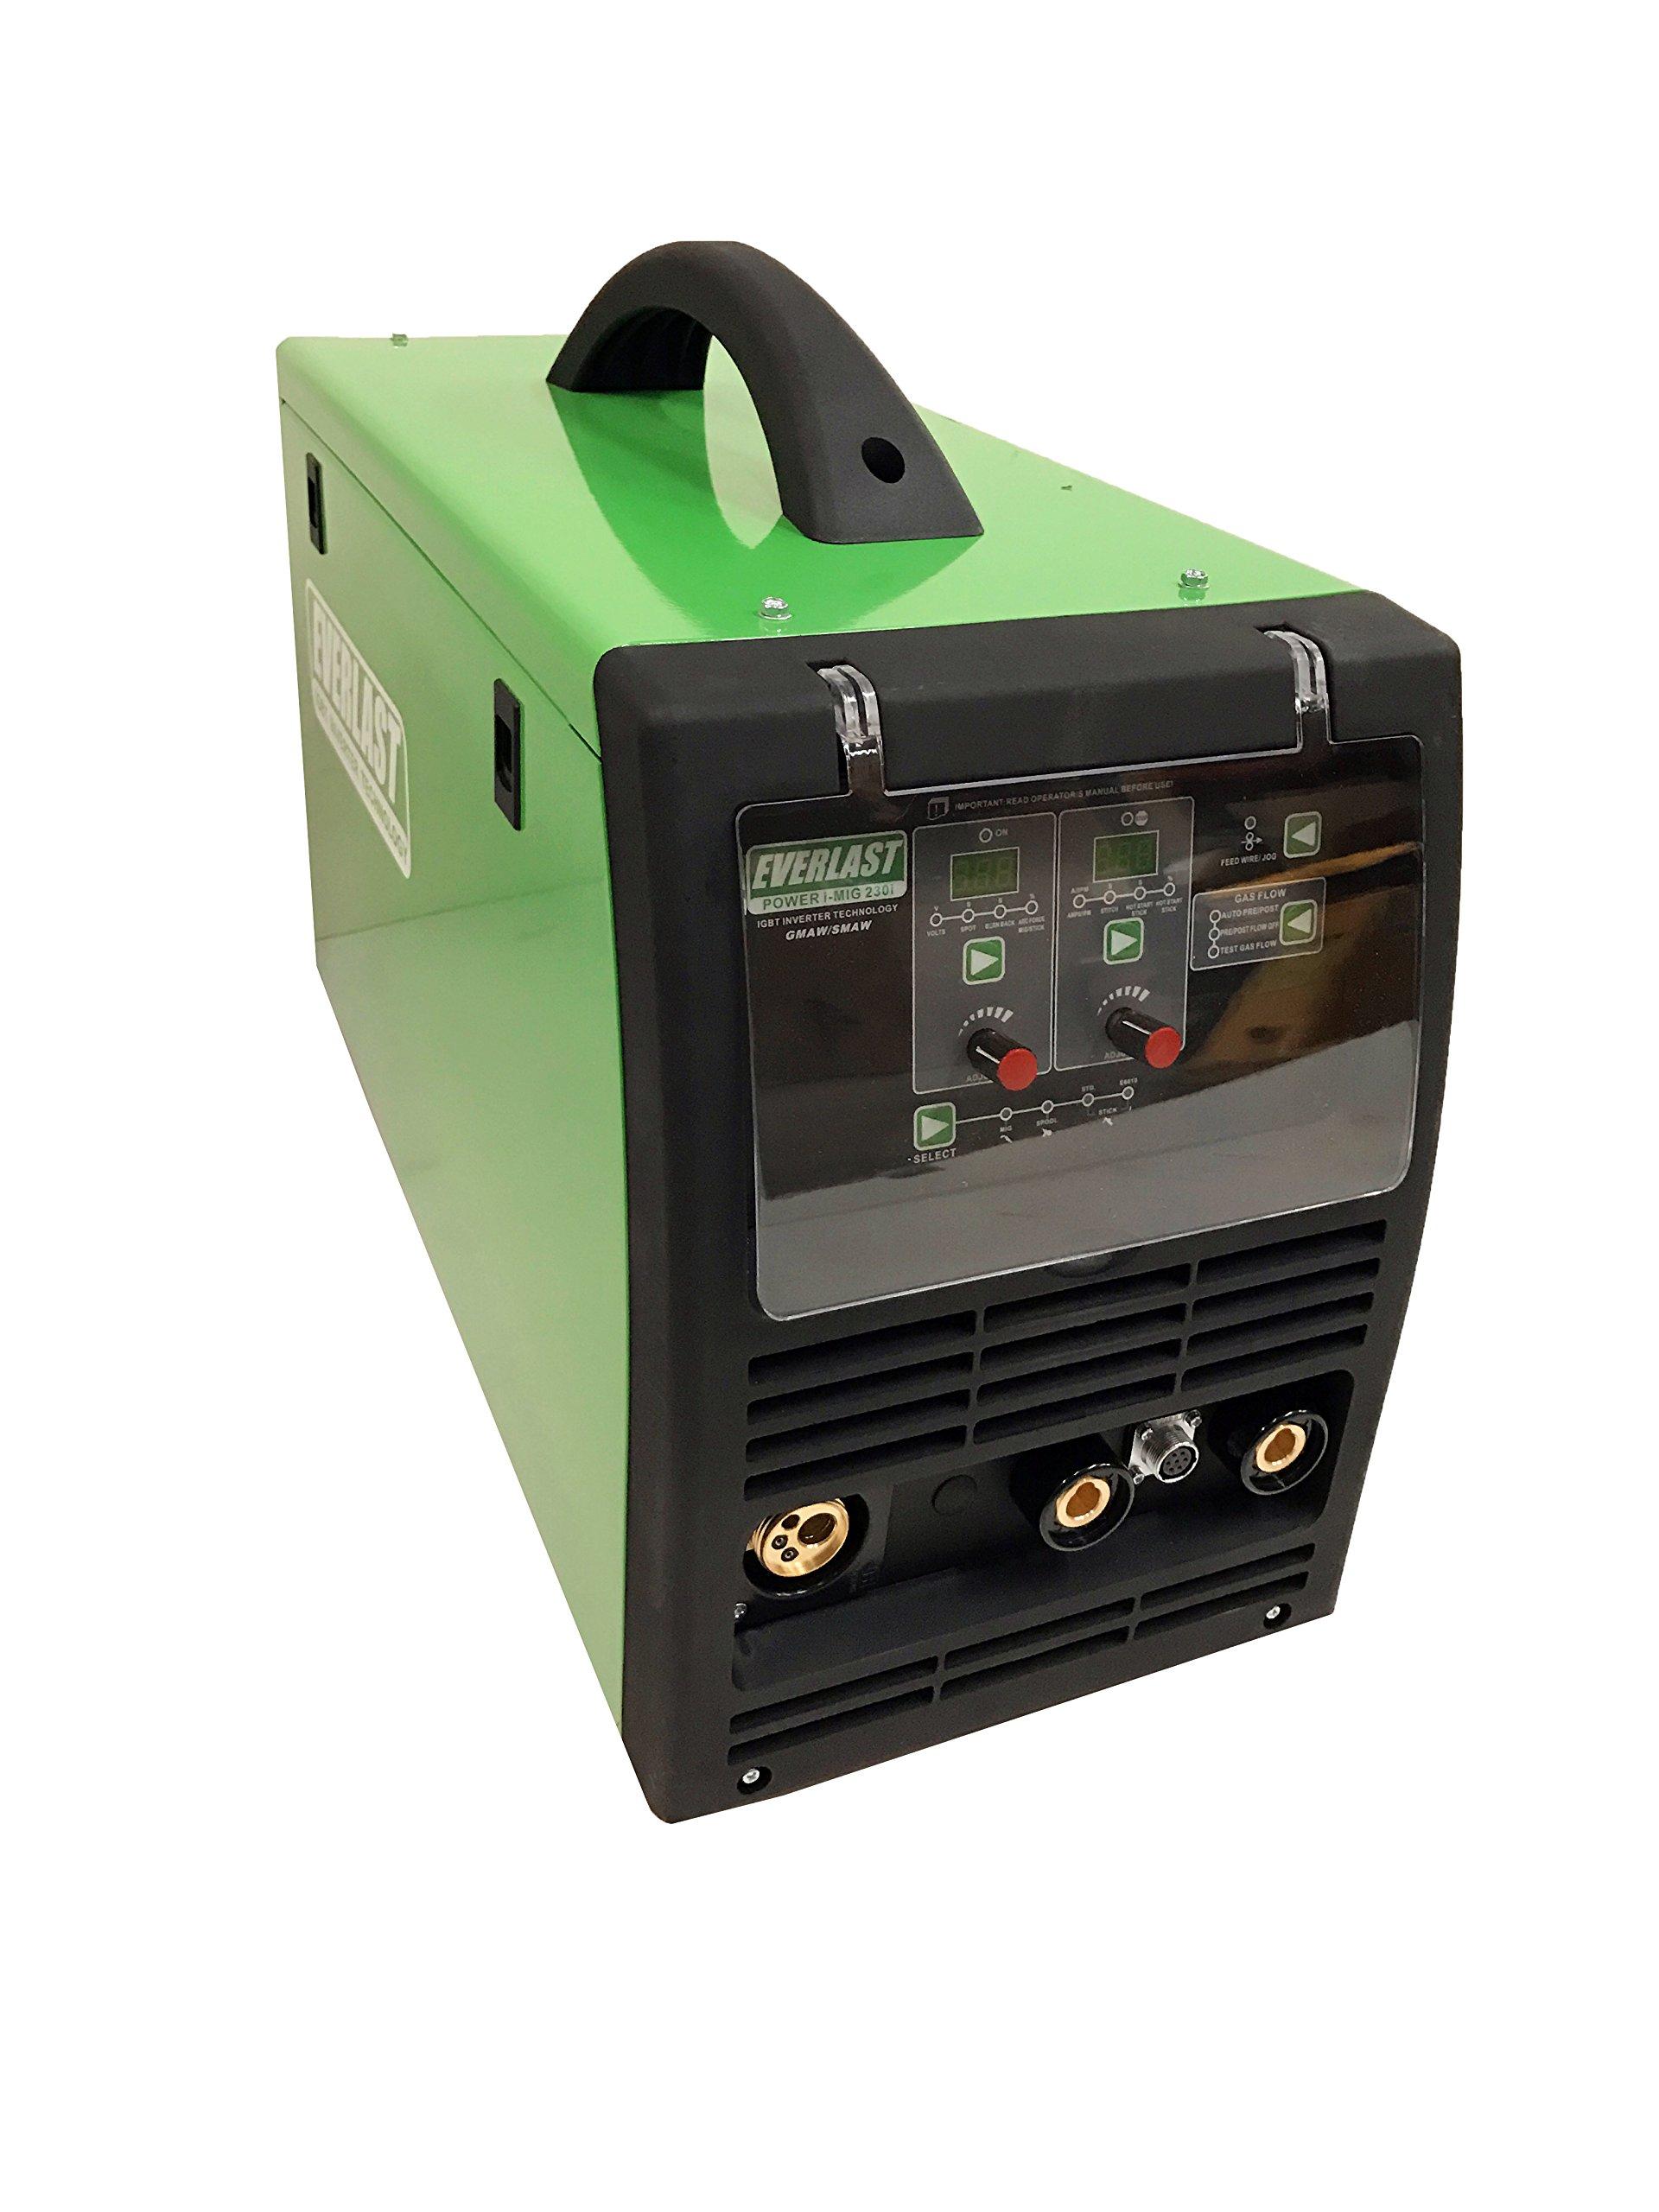 2017 Everlast PowerMIG 230i 230amp MIG STICK Welder 110/220 Dual Voltage